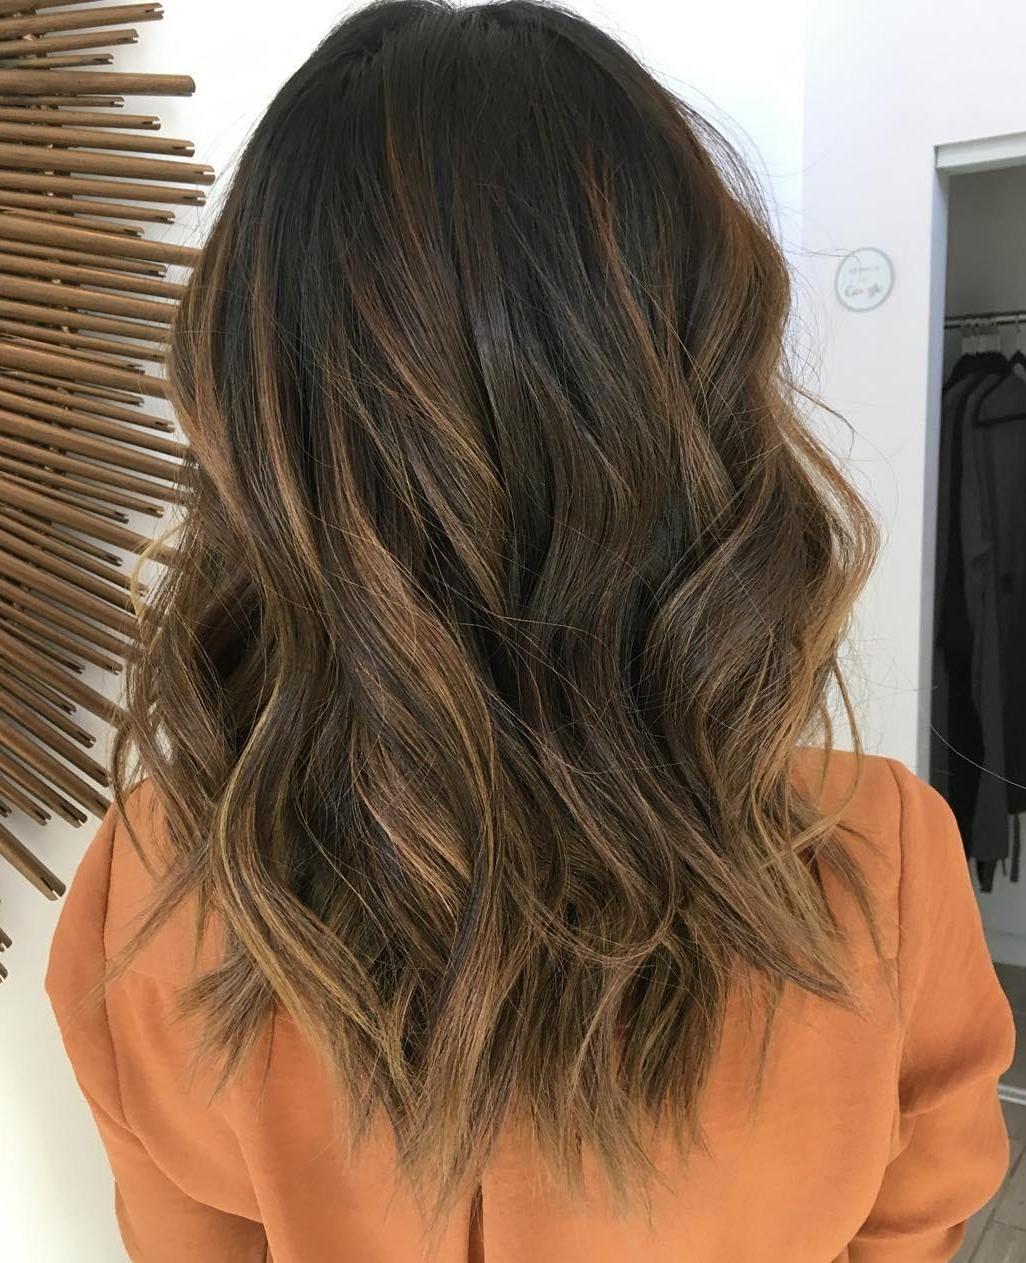 70 Flattering Balayage Hair Color Ideas For 2019 Hair Color Balayage Balayage Hair Blonde Bayalage Hair